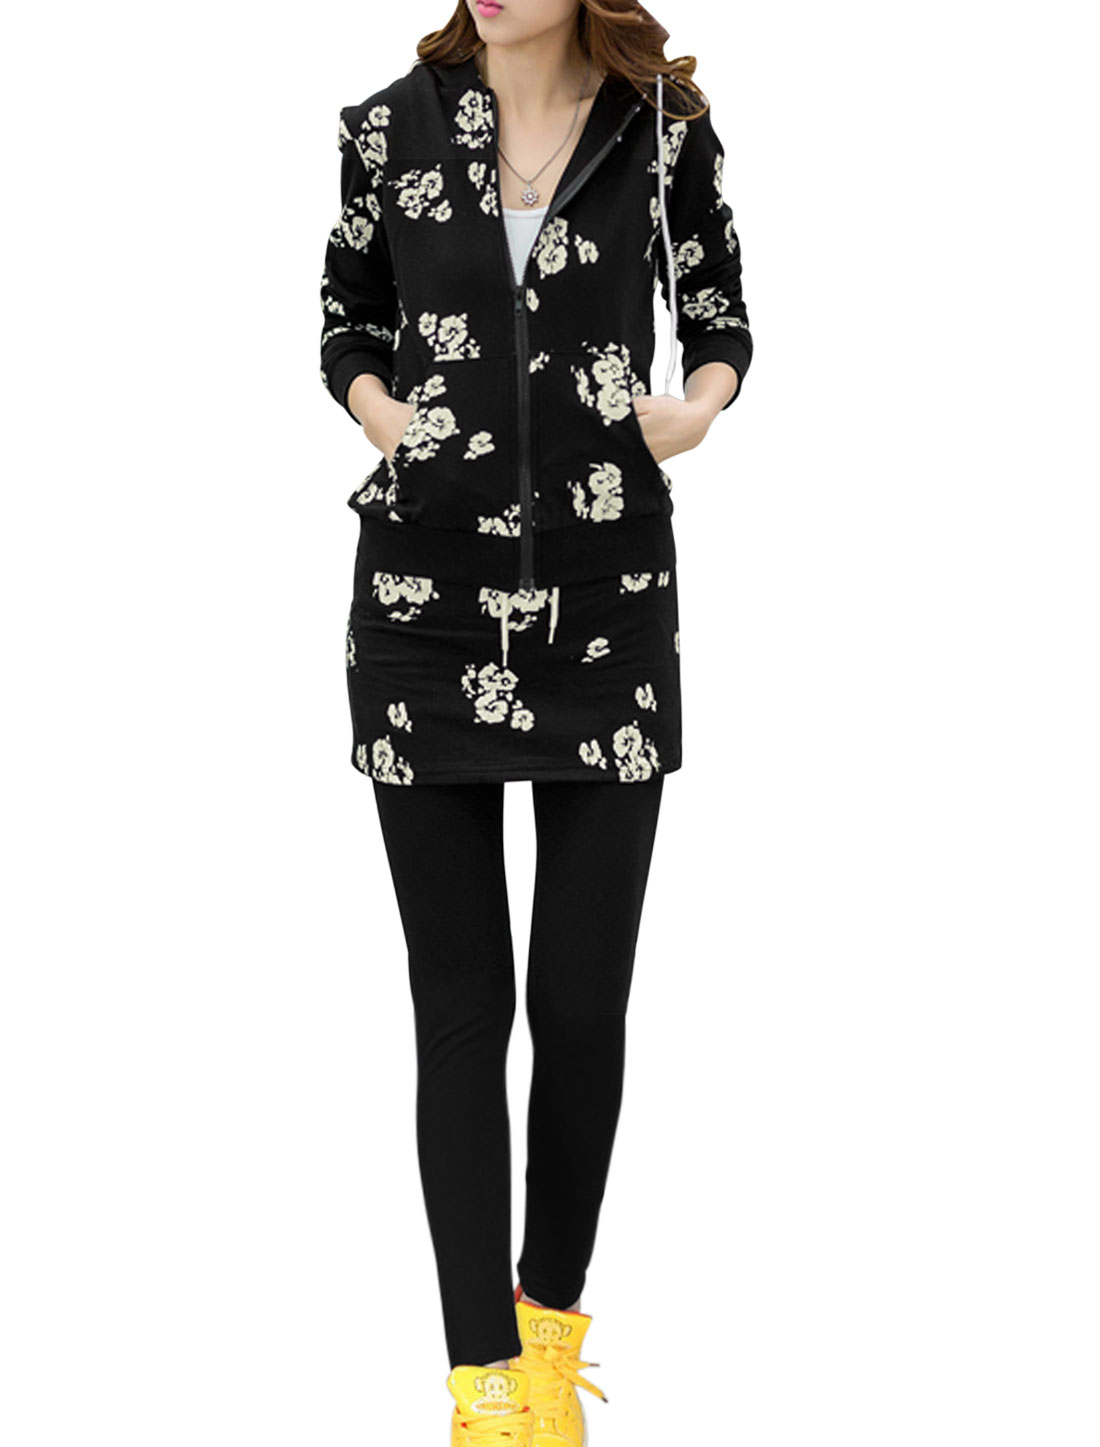 Women Floral Prints Hooded Jacket w Elastic Waist Casual Skirt Leggings Black XS